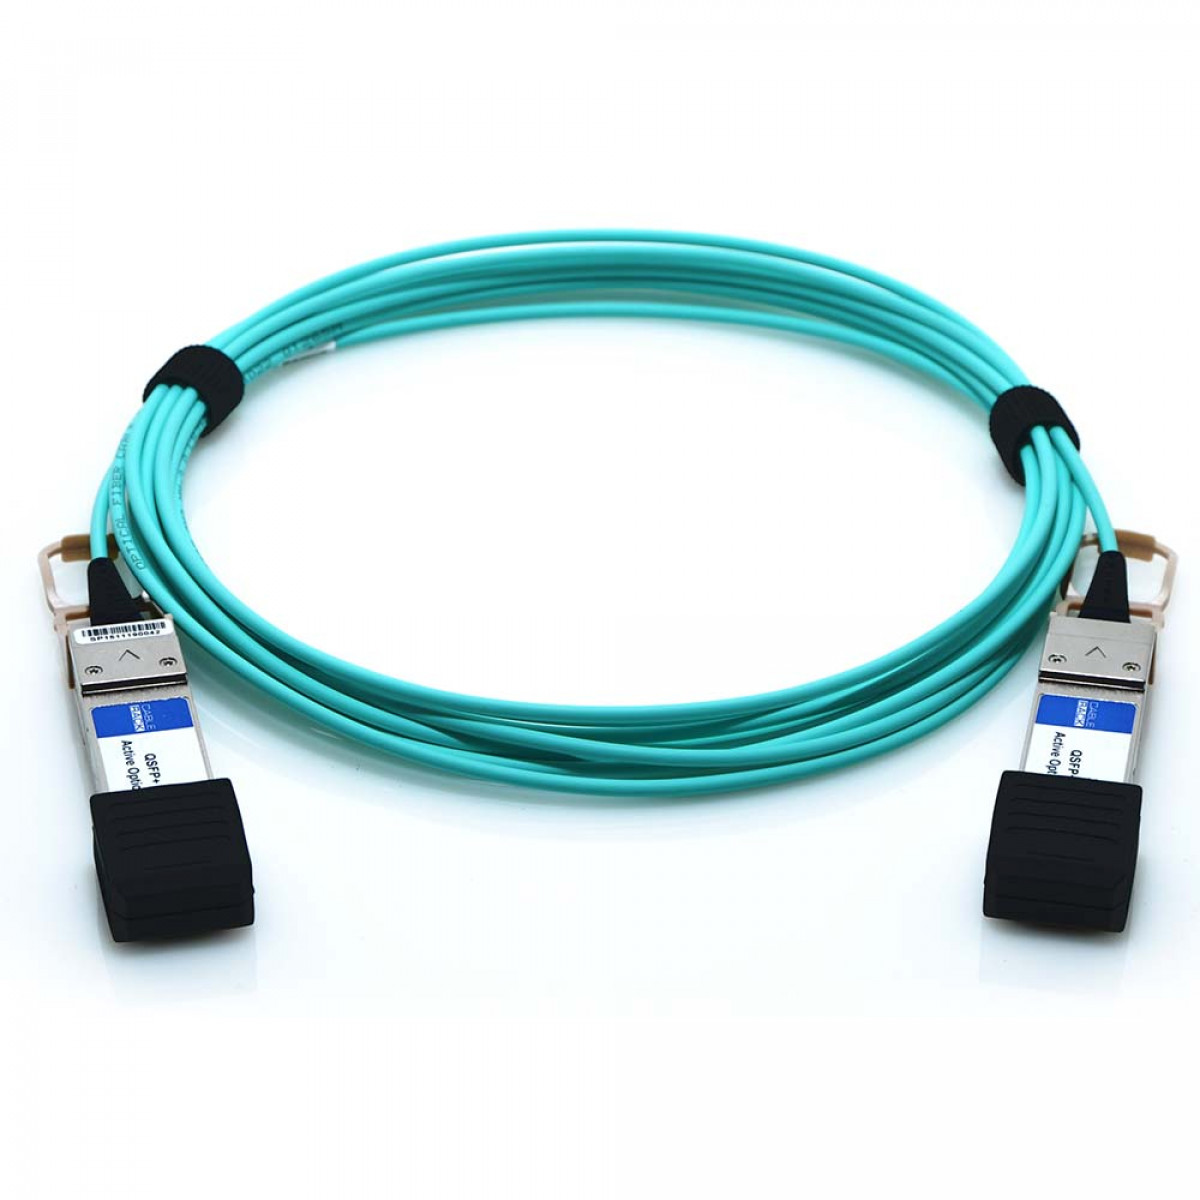 25m QSFP+ 40Gbps Fiber Optic Active Infiniband QDR Plenum Cable